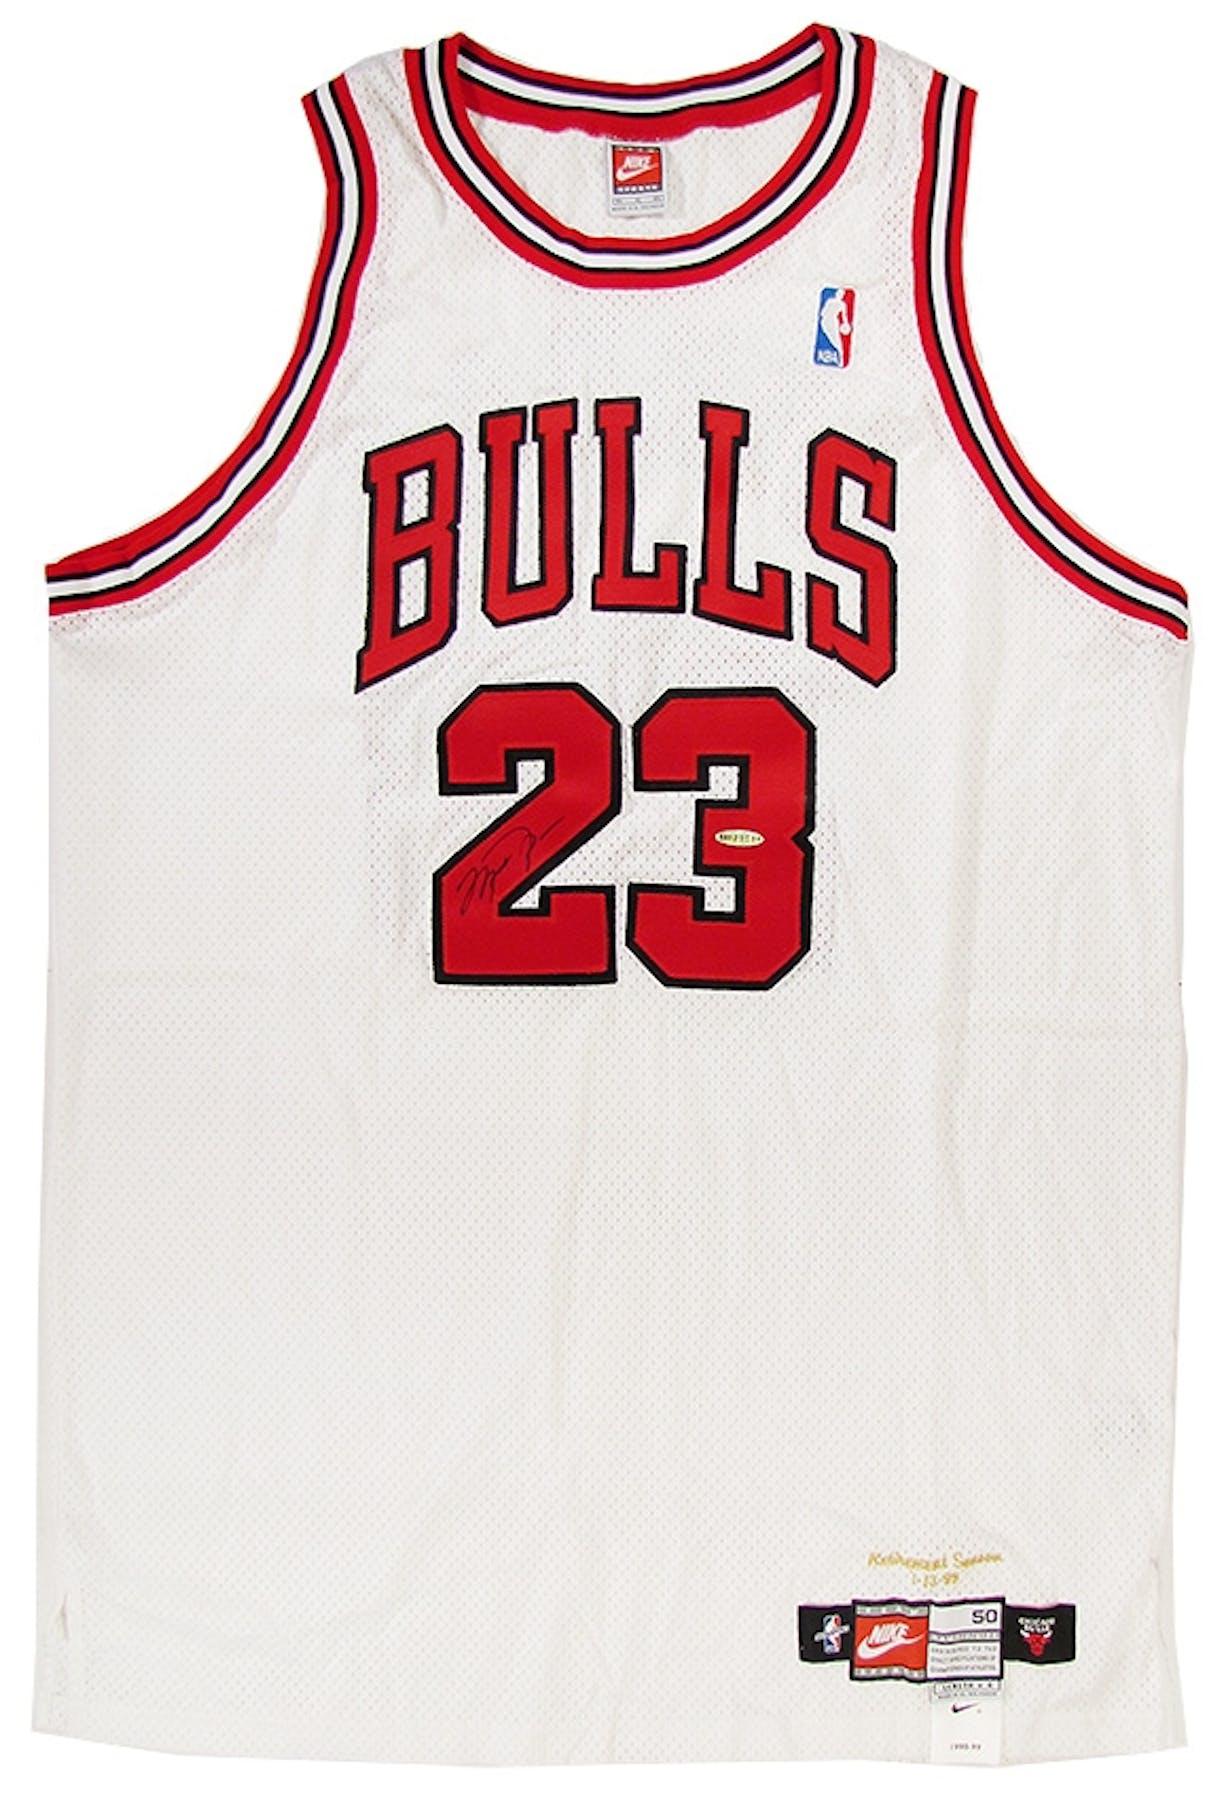 10f1293a2 Michael Jordan Autographed Chicago Bulls 98 99 Retirement Jersey ...